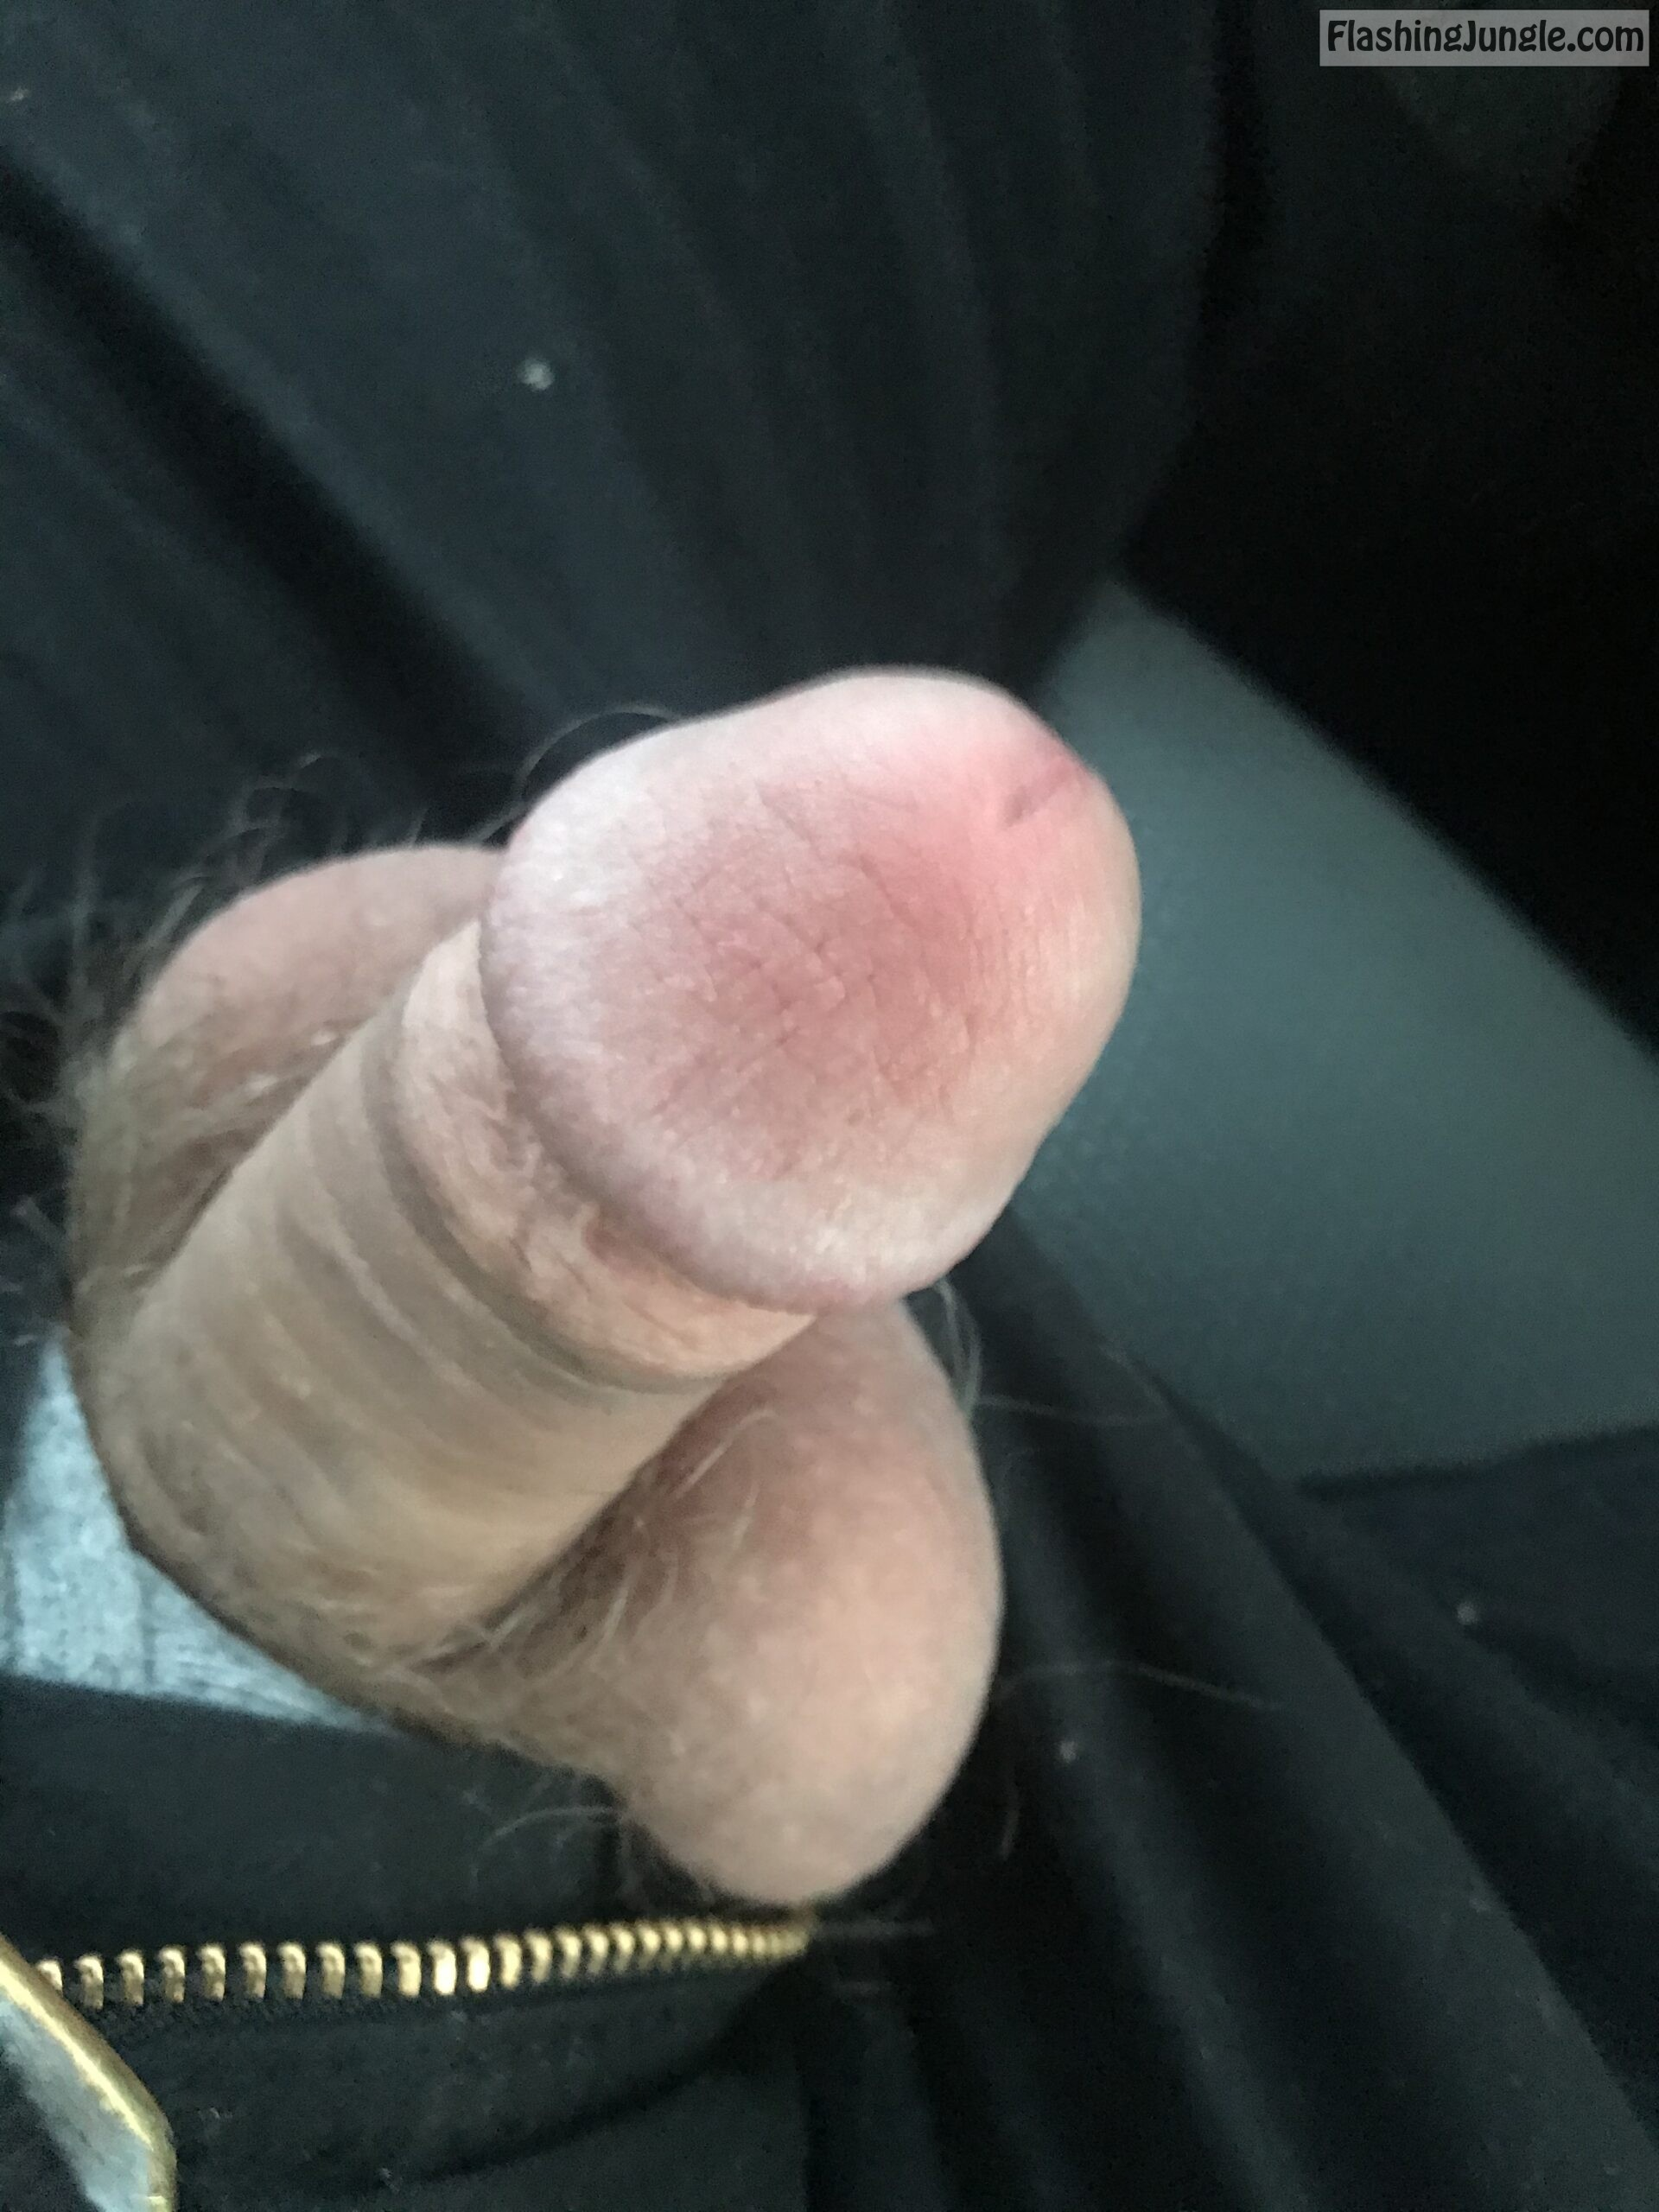 Real Amateurs Dick Flash Pics